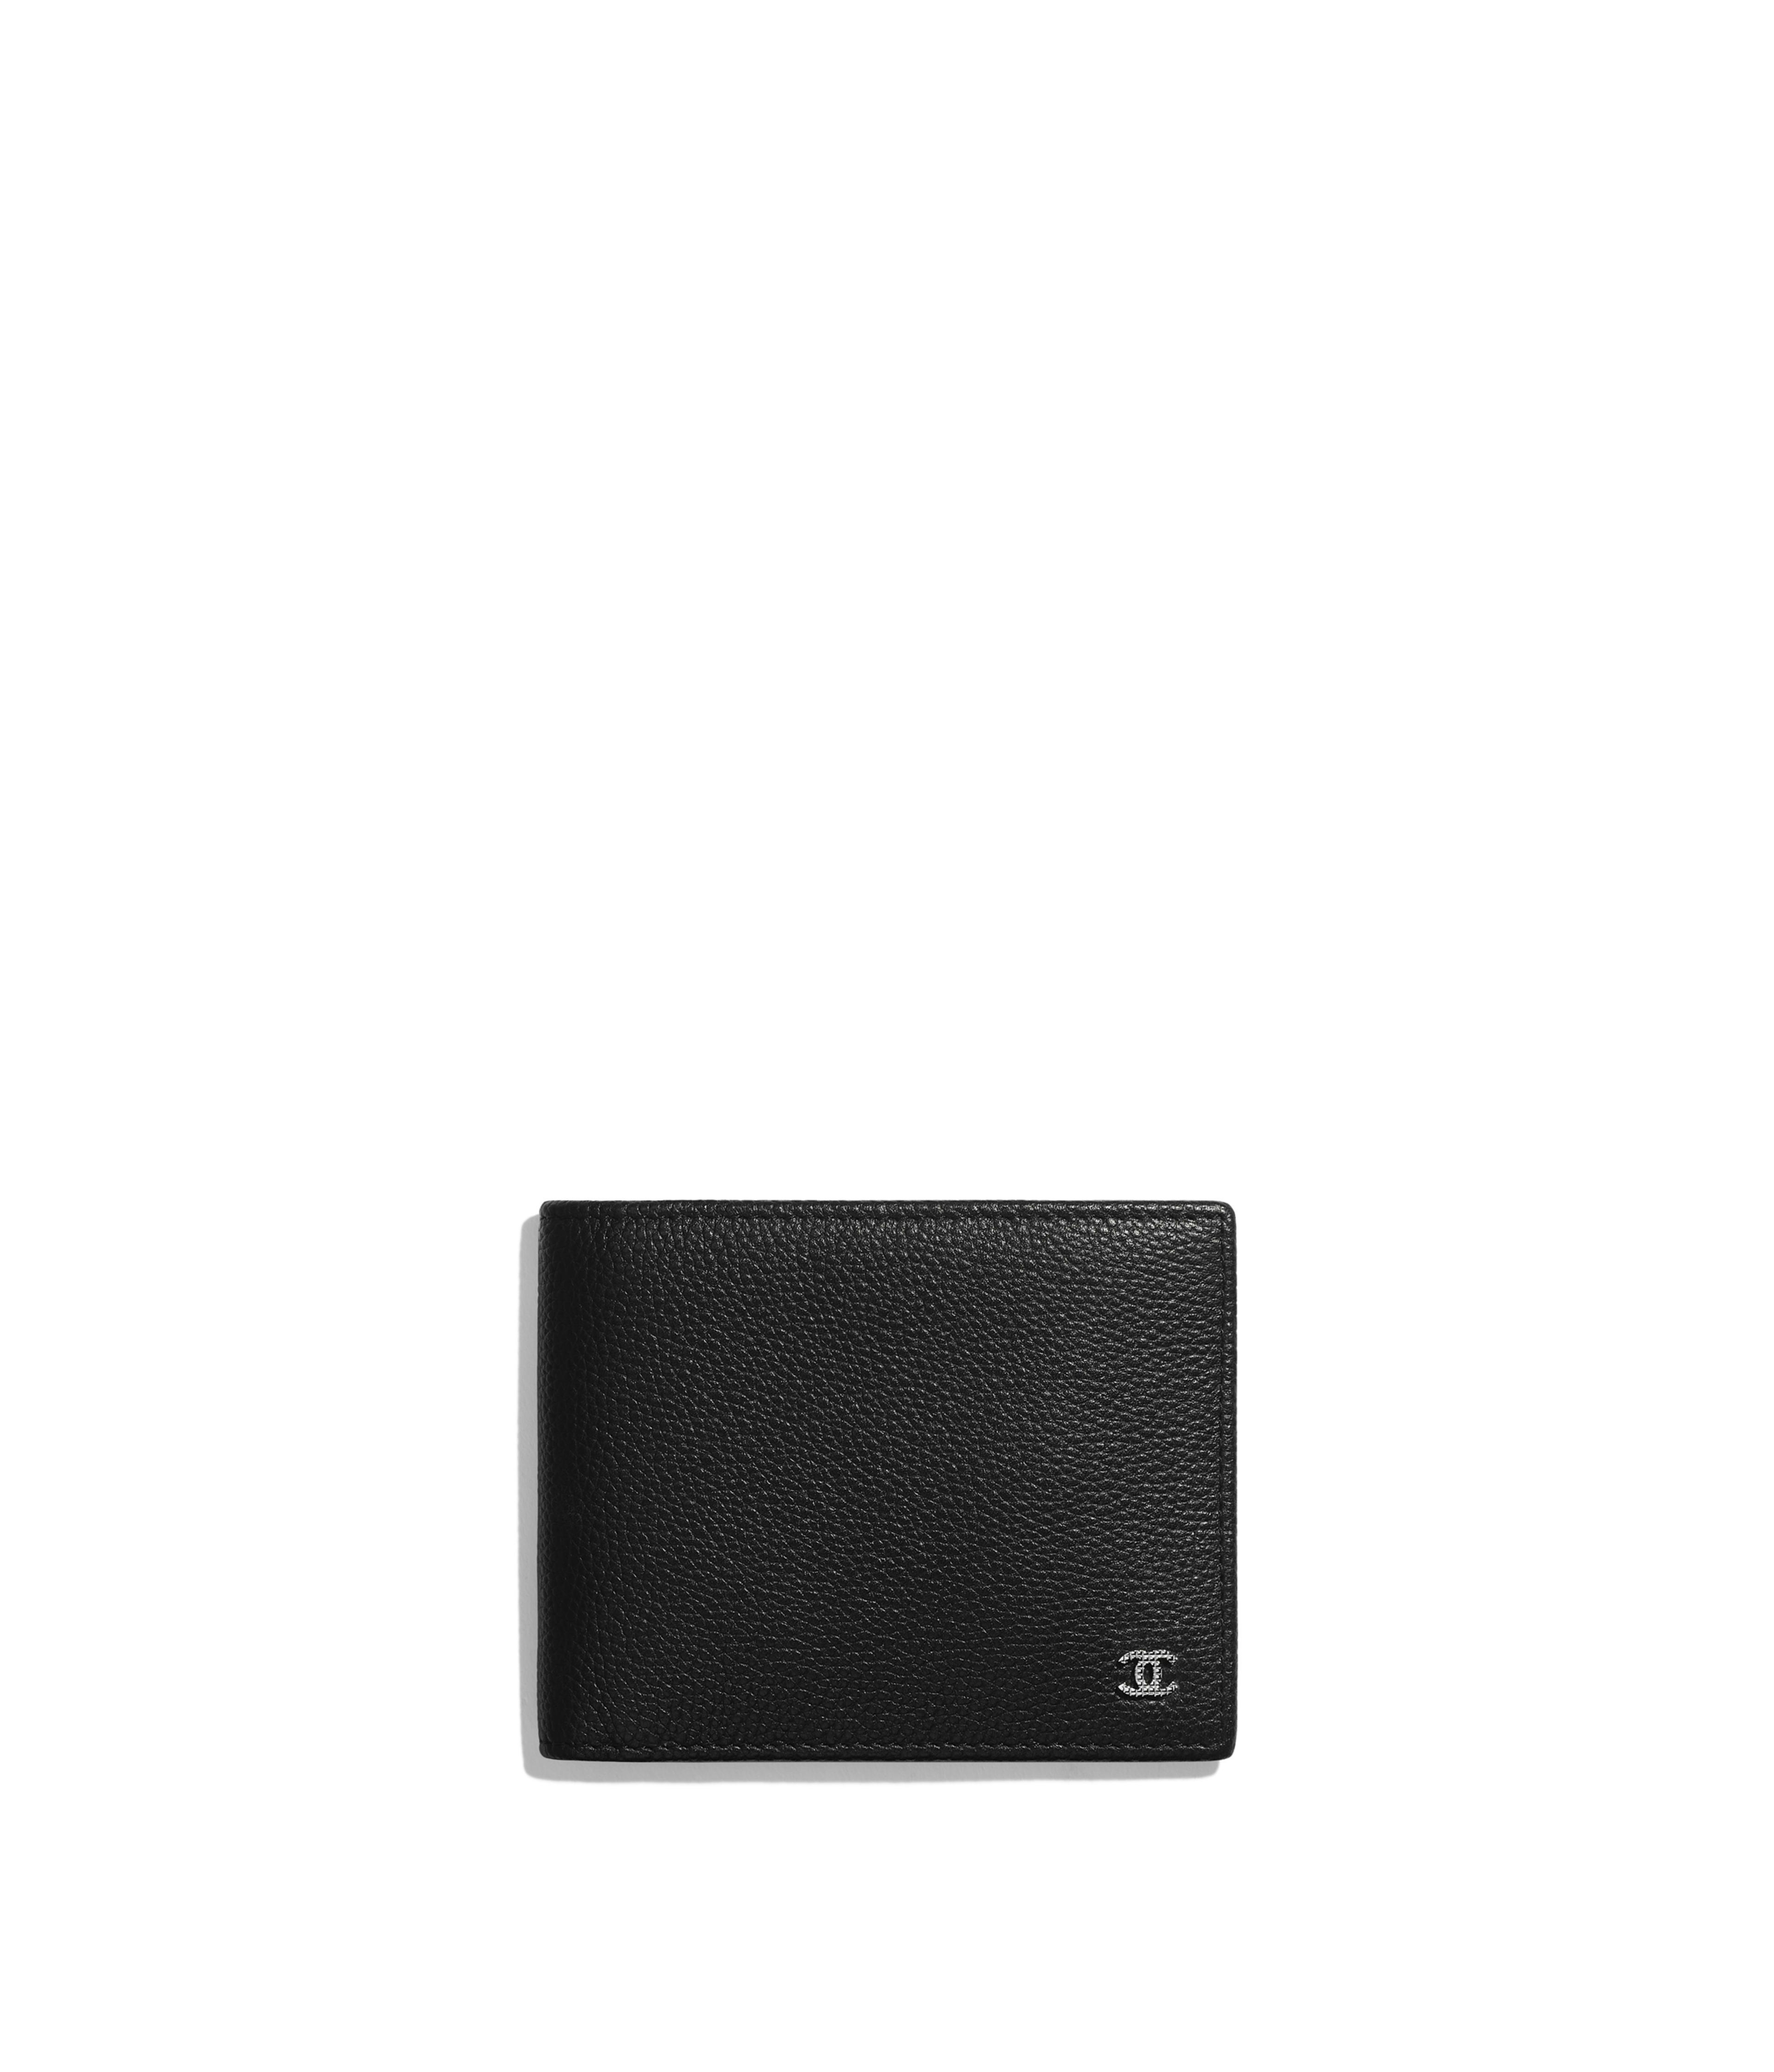 Grained Calfskin   Ruthenium-Finish Metal Navy Blue Small Wallet ... 495f1a5ca